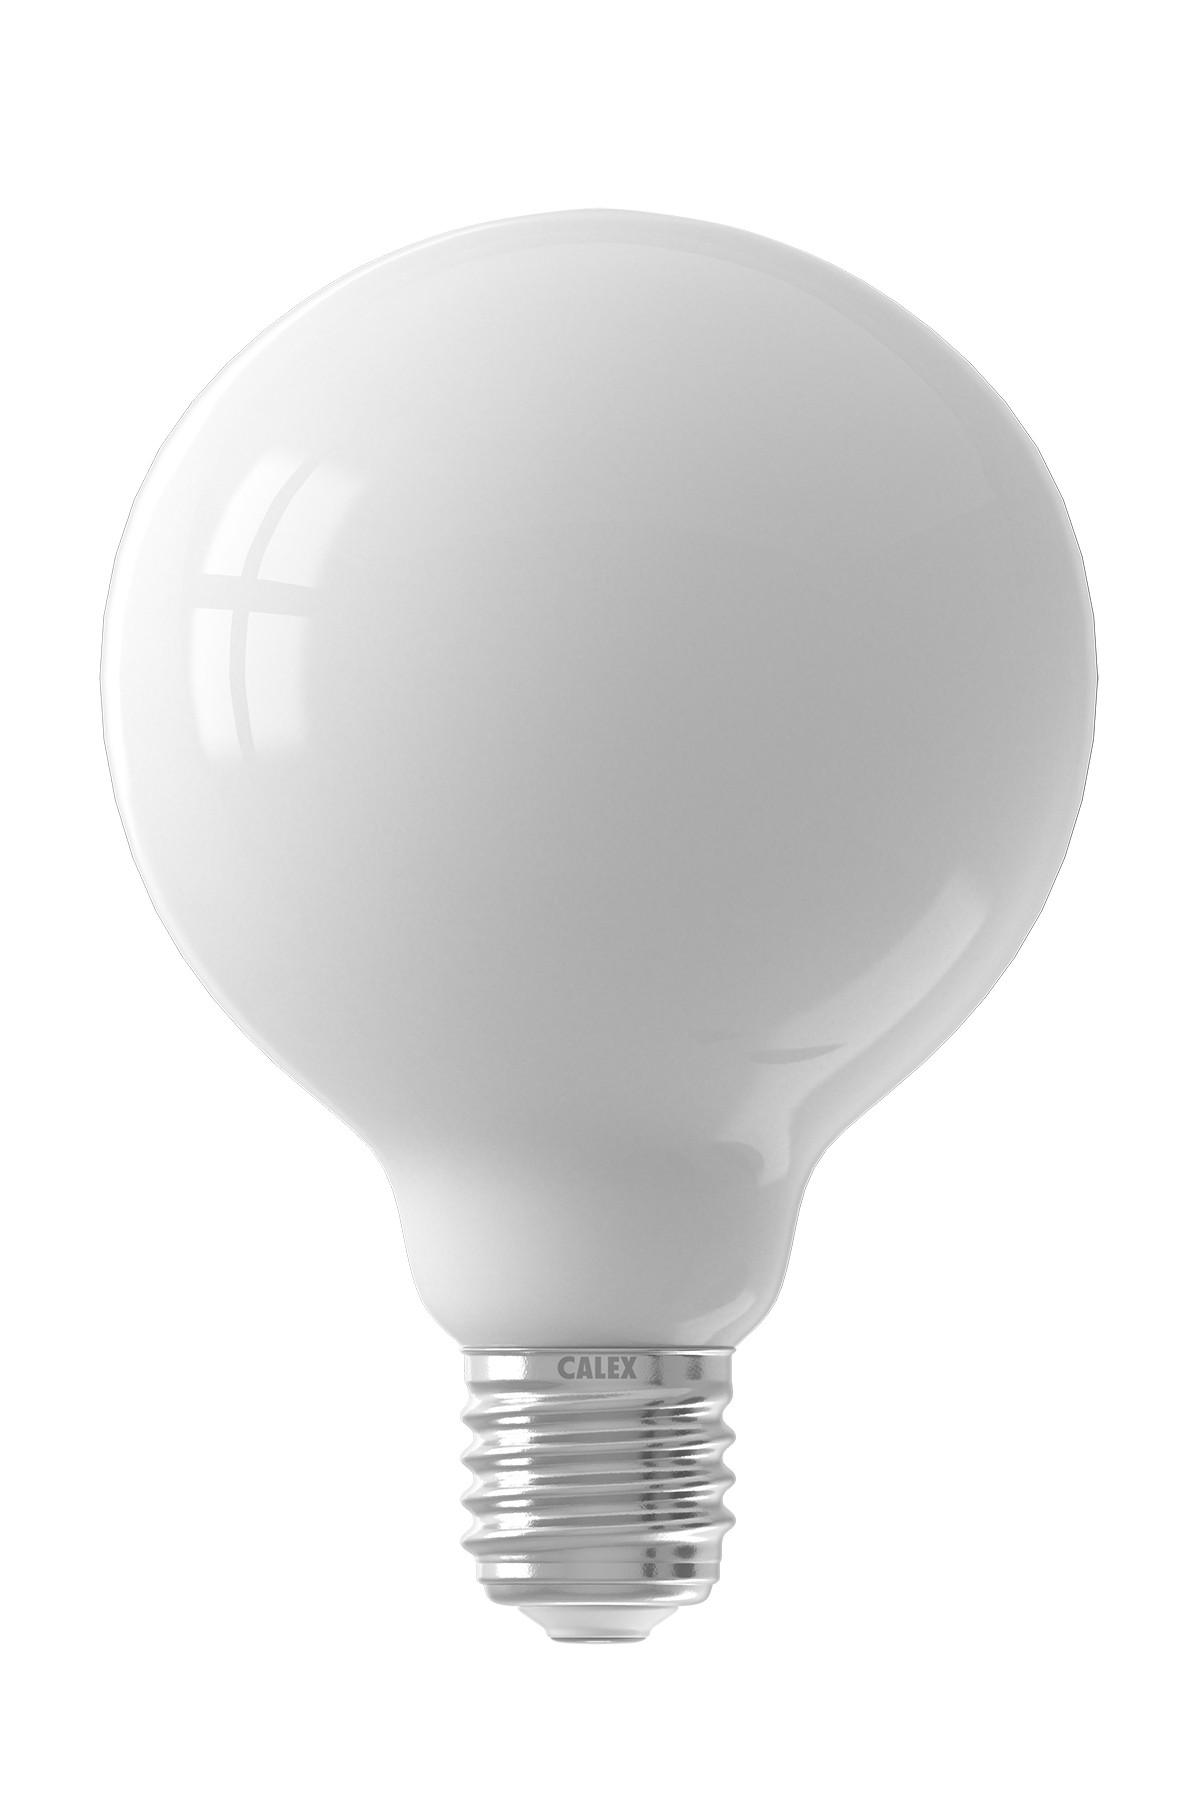 Filament Led Dimmable Globe Lamp 240v 6w E27 Calex